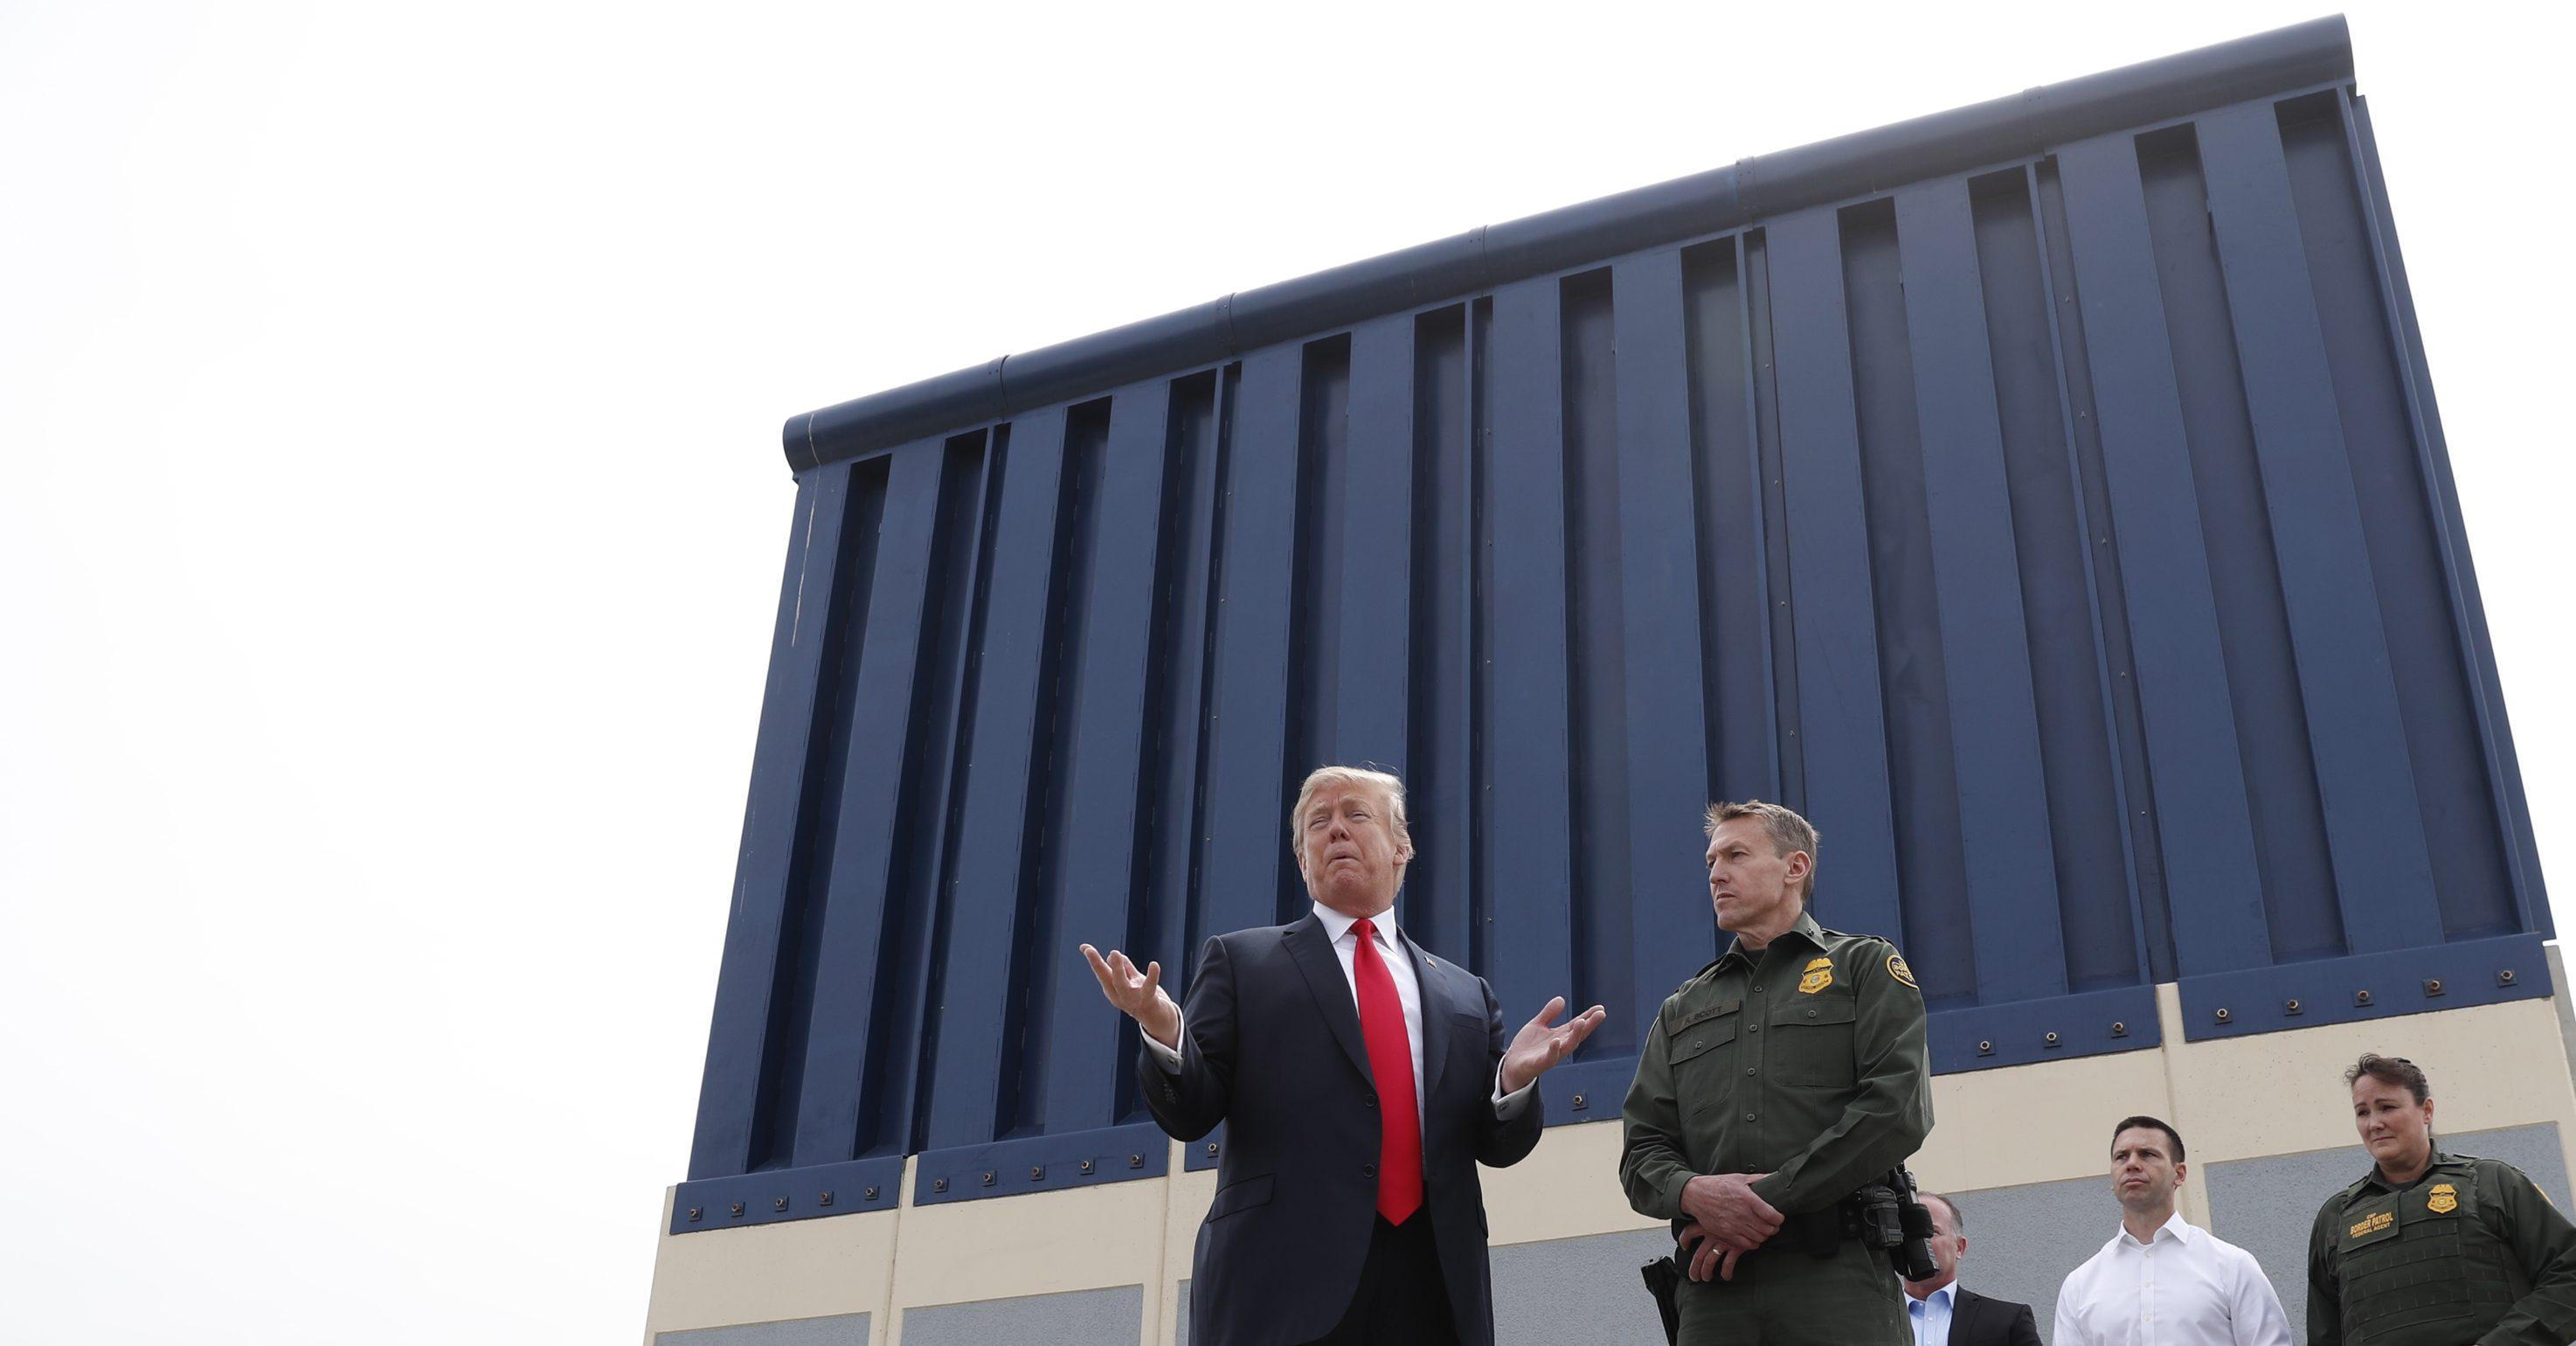 U.S. President Donald Trump visits border wall prototypes